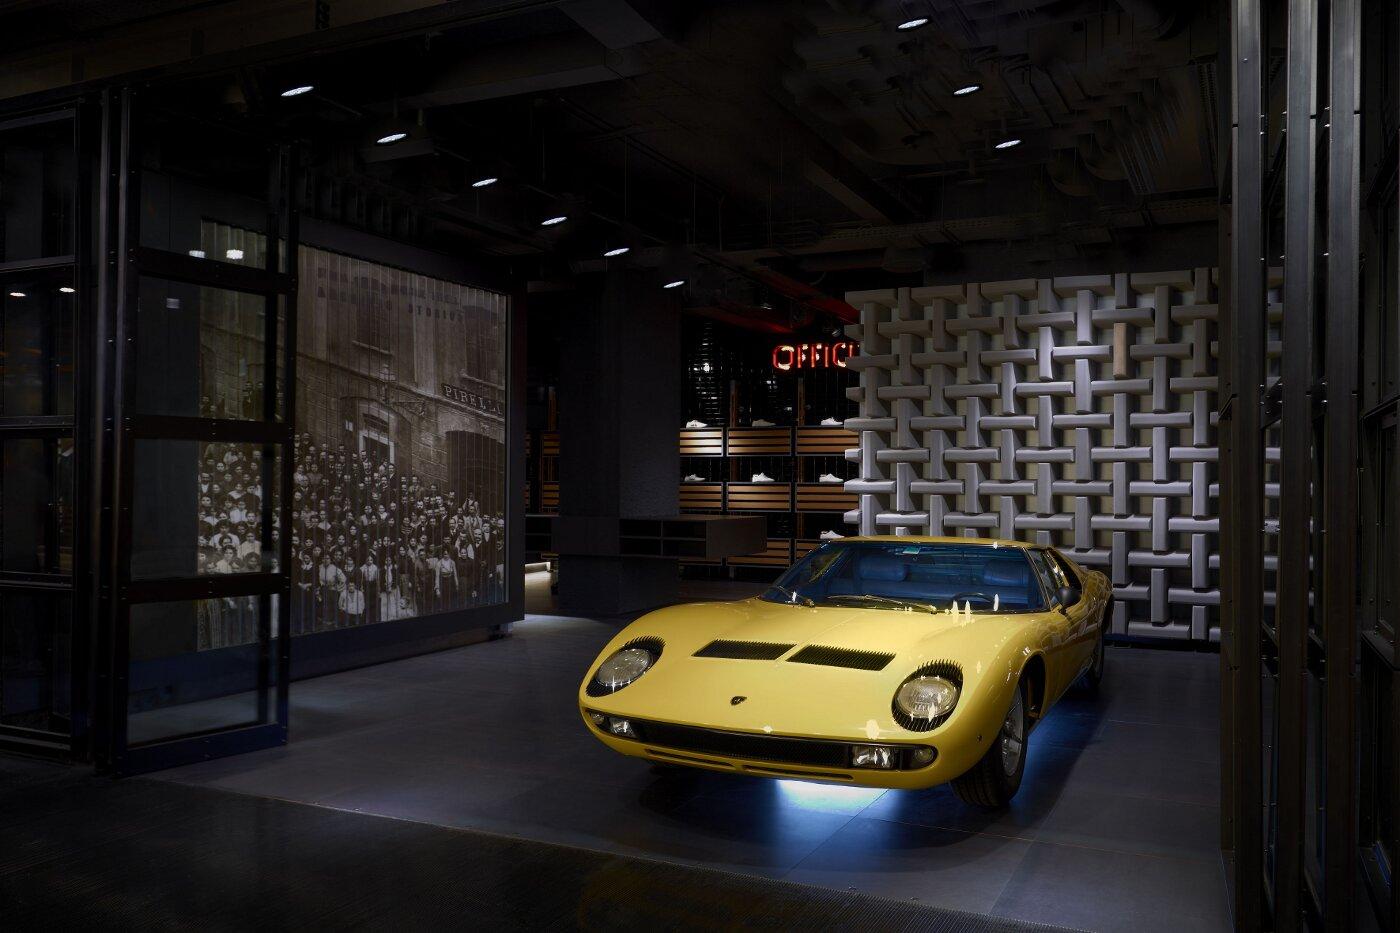 Pirelli Flagship Store - Anecoica Wall - Milano Corso Venezia